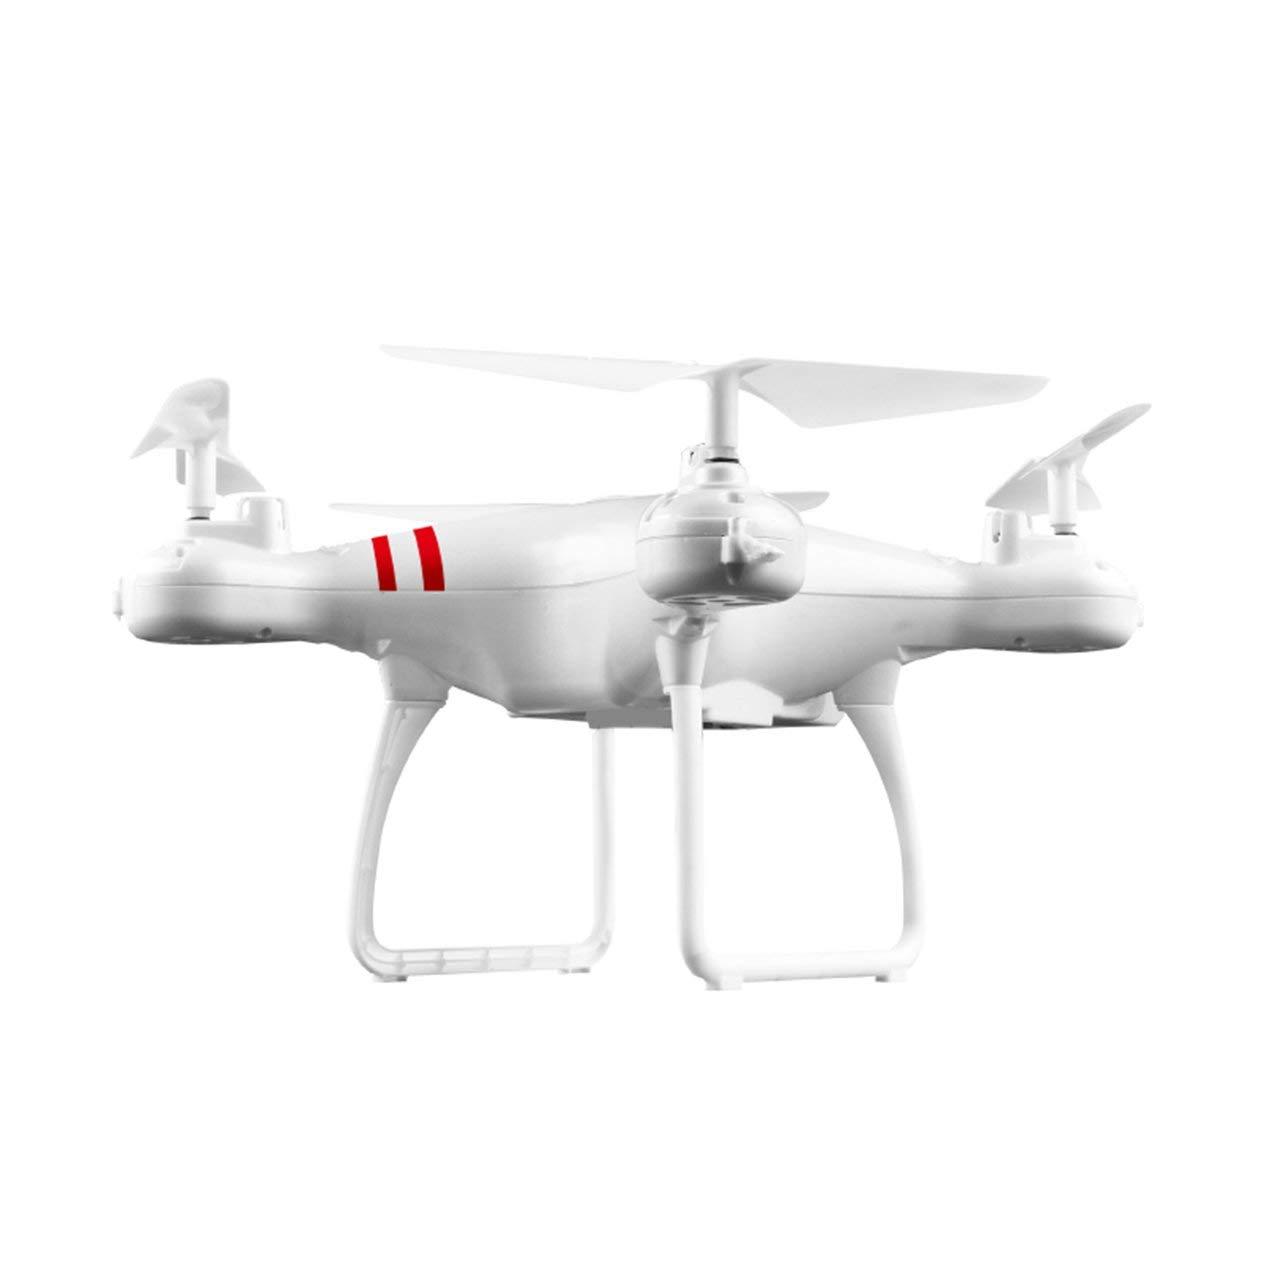 HJMAX WiFi Control 4-Achsen-Drohne schwebender Rennhubschrauber Drohne Drohne Drohne schwebender Rennhubschrauber Profissional FPV 80c310